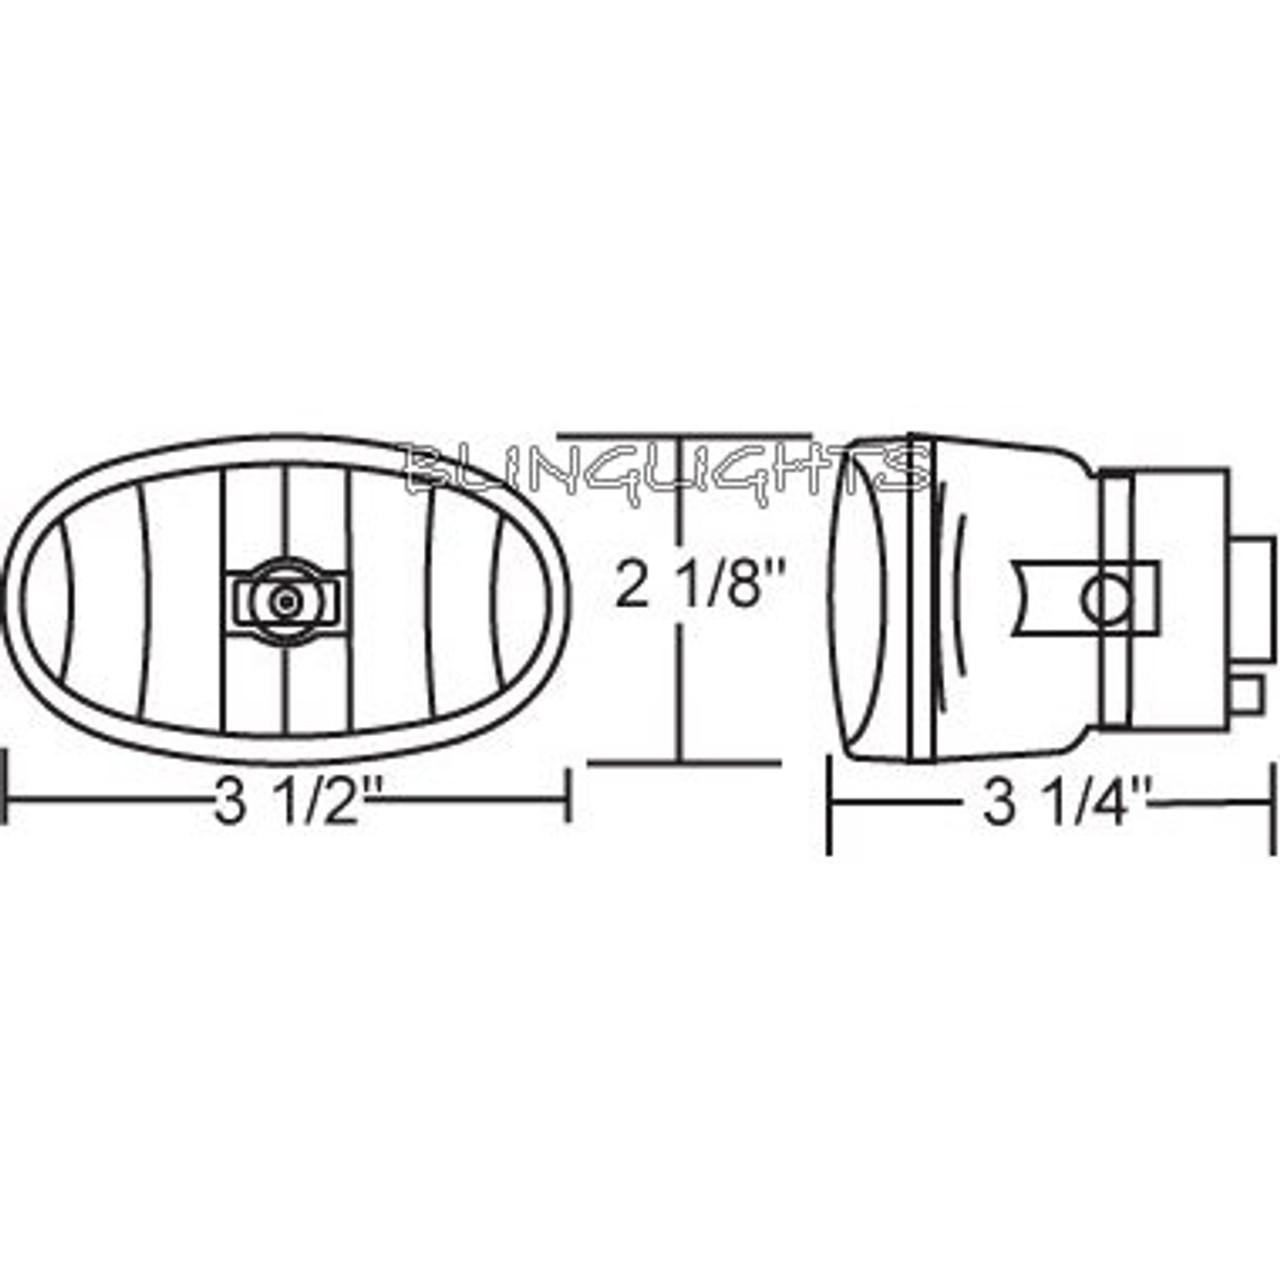 hight resolution of yamaha tdm 850 wiring diagram wiring diagramyamaha tdm 850 wiring diagram